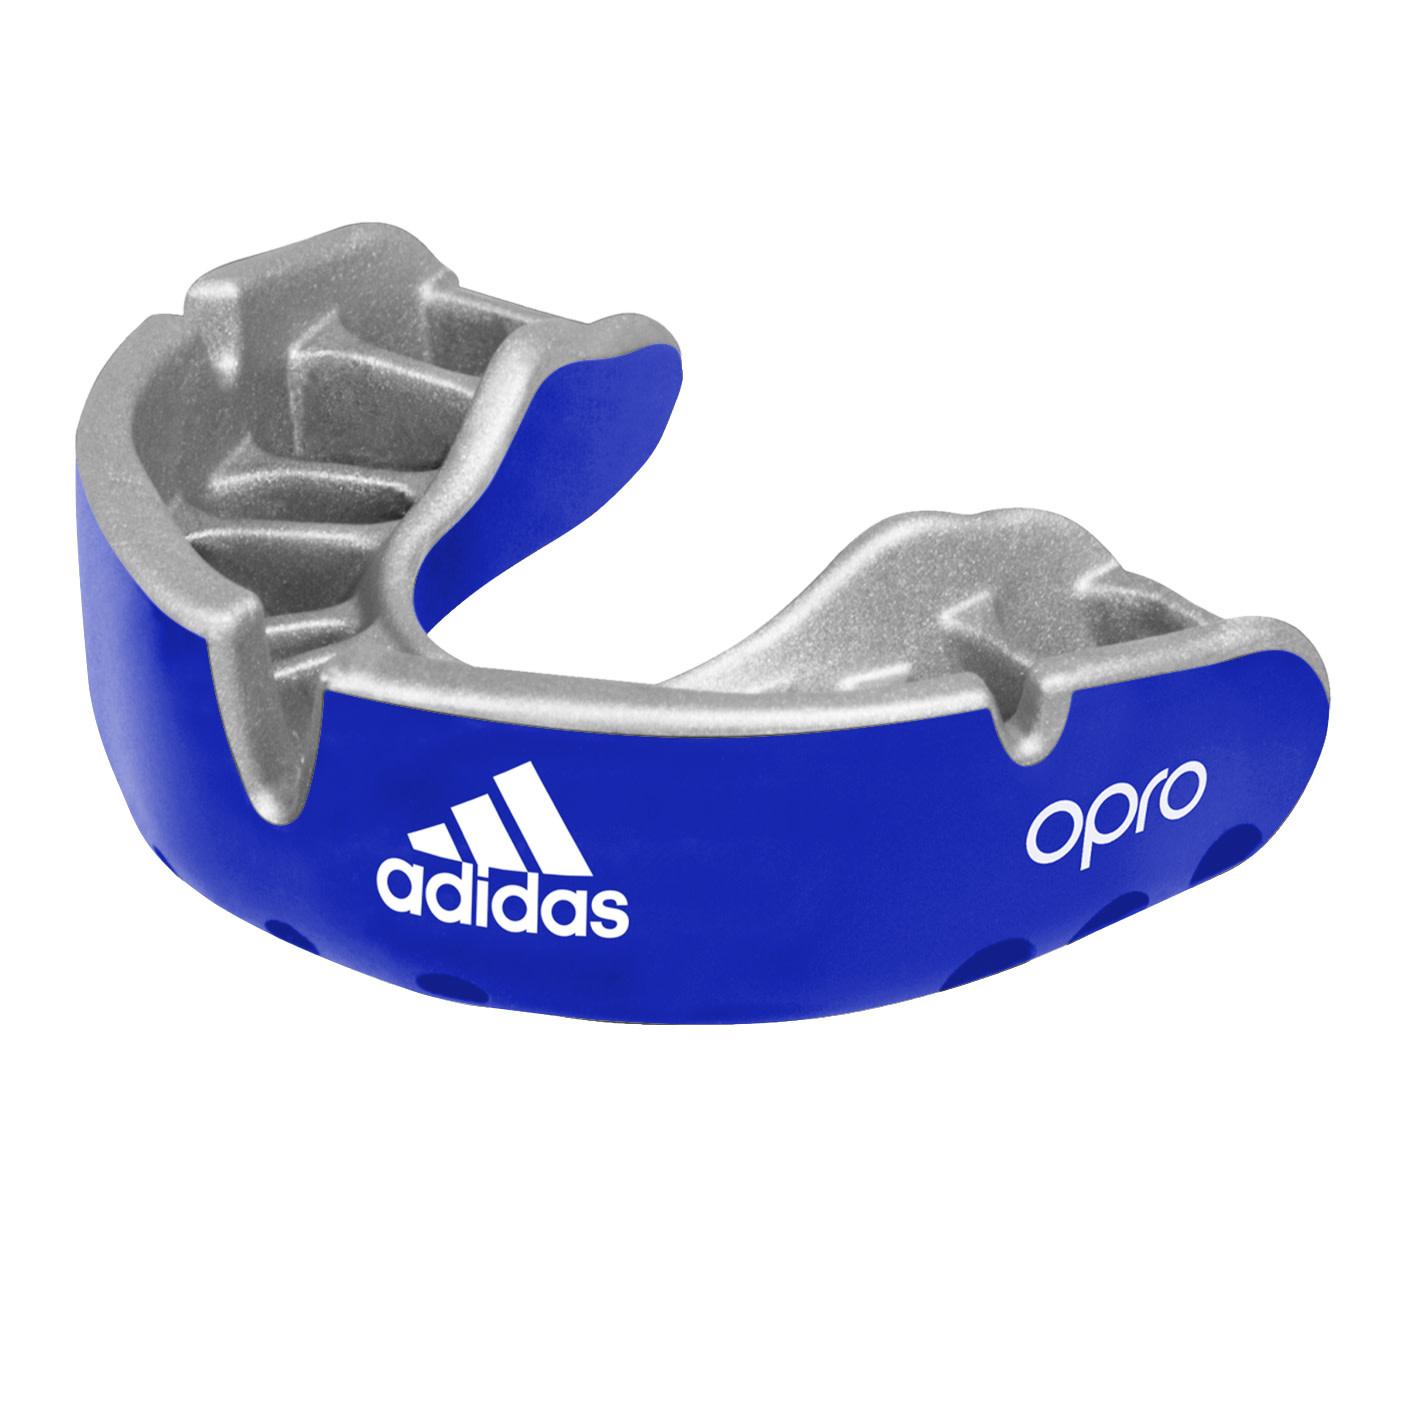 Adidas Adidas mouthguard braces gold blauw